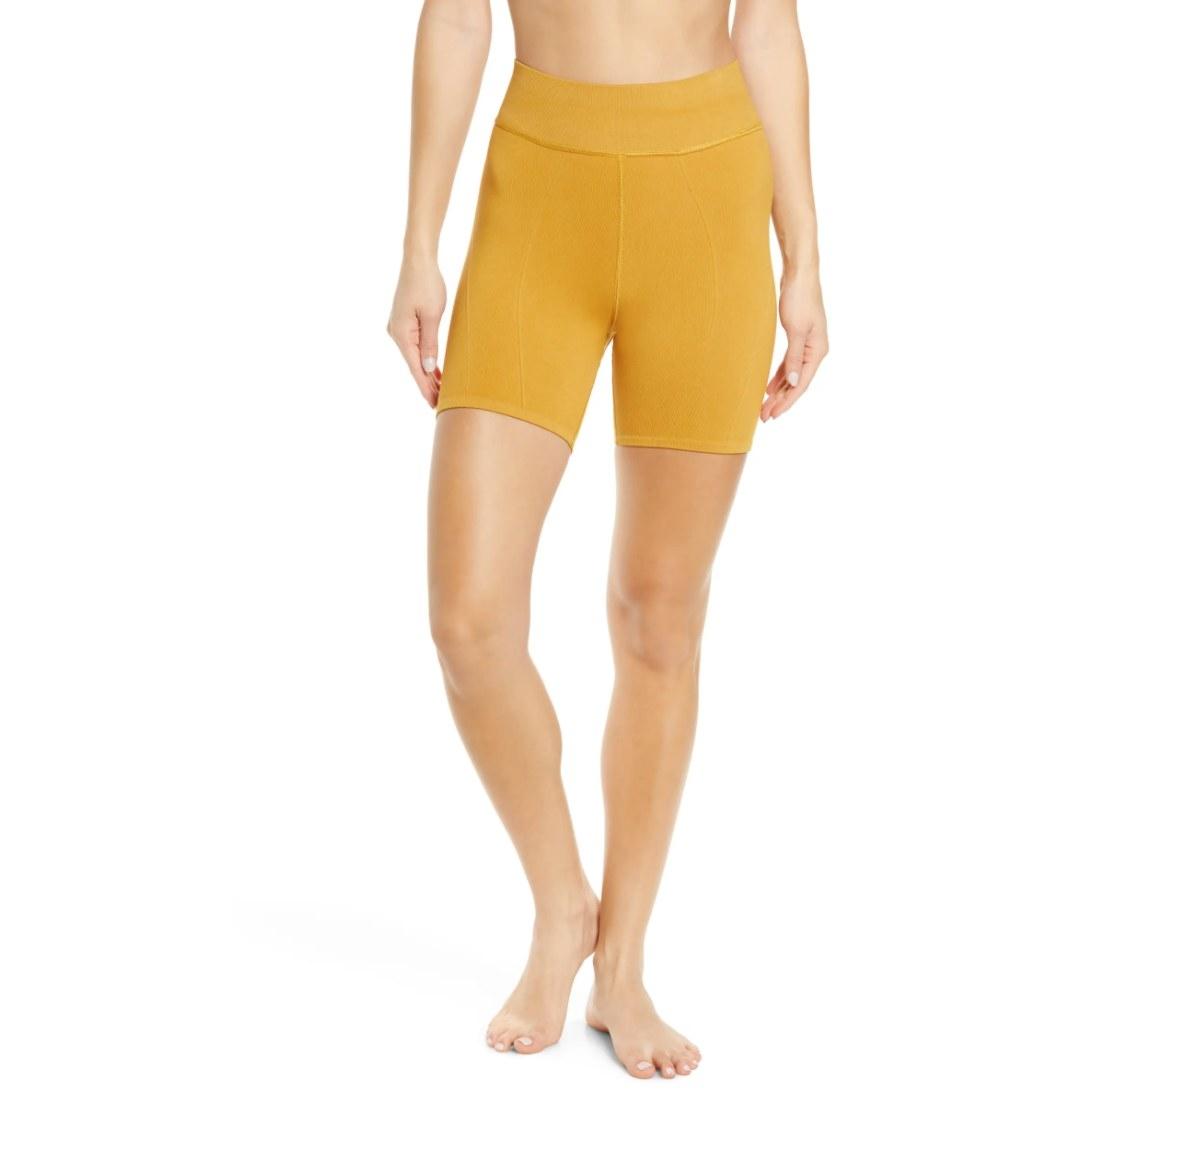 the pair of seamless bike shorts in tumeric